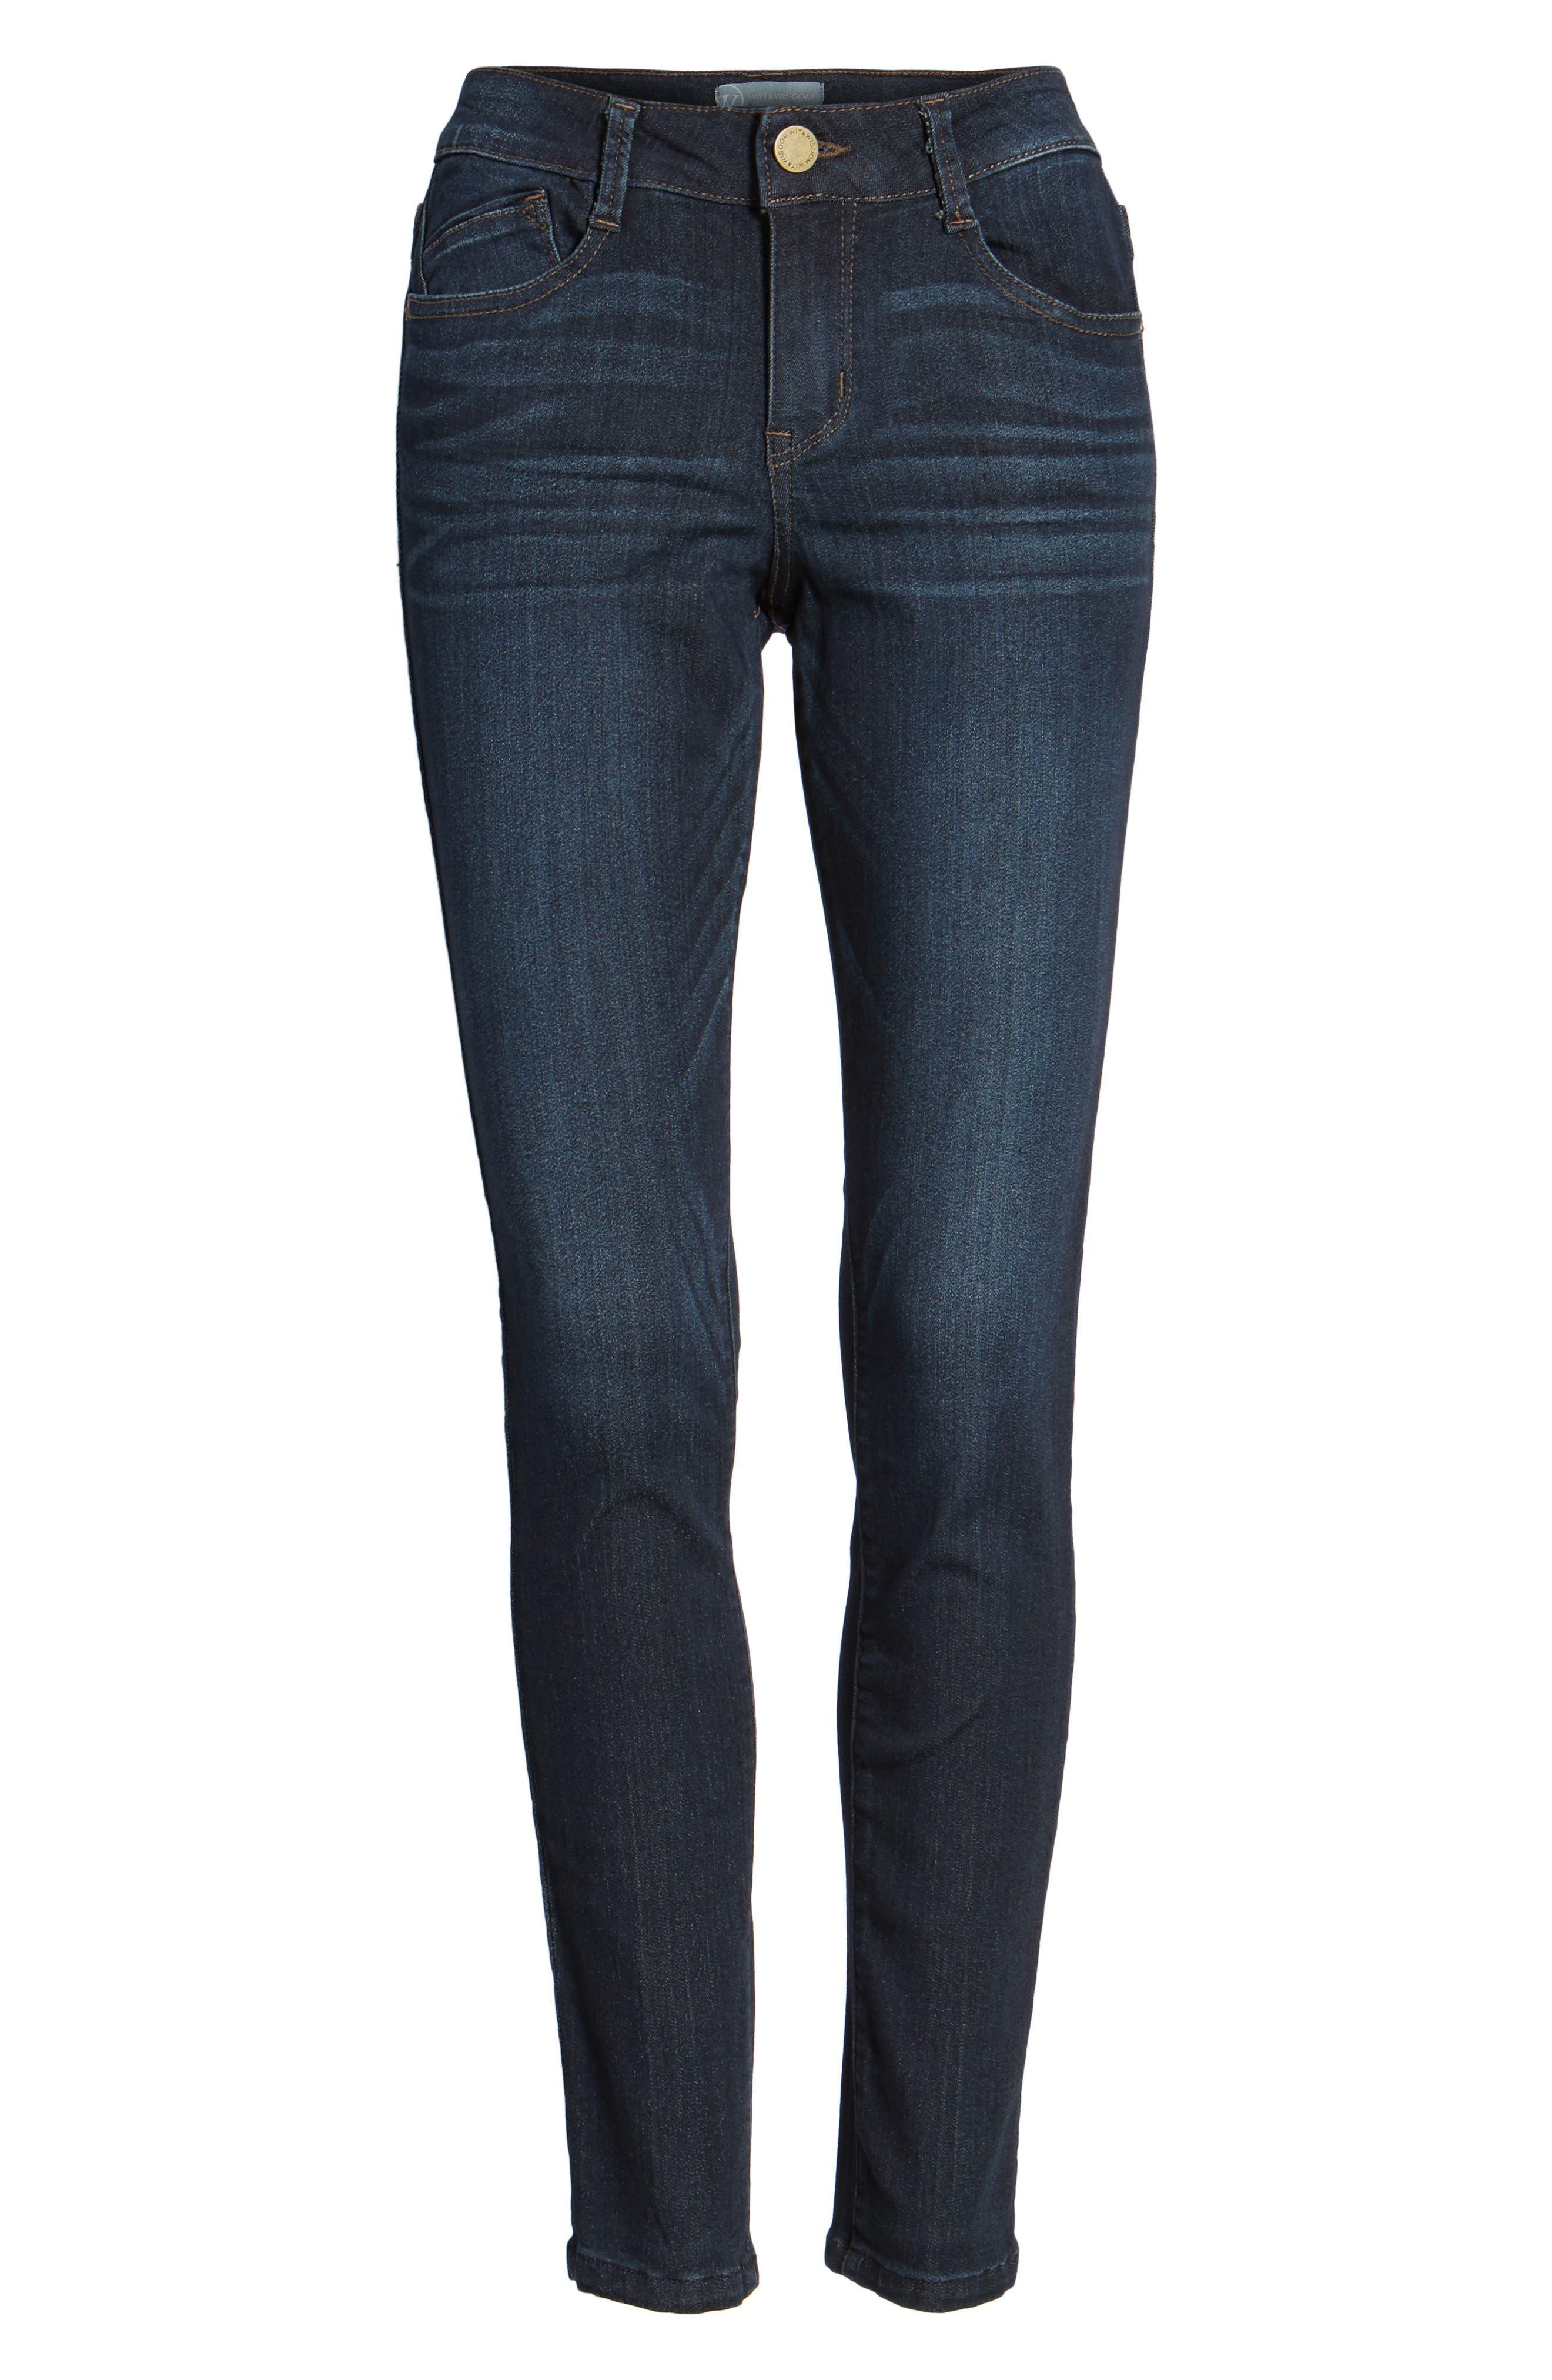 WIT & WISDOM, Super Smooth Stretch Denim Skinny Jeans, Alternate thumbnail 5, color, DARK NAVY